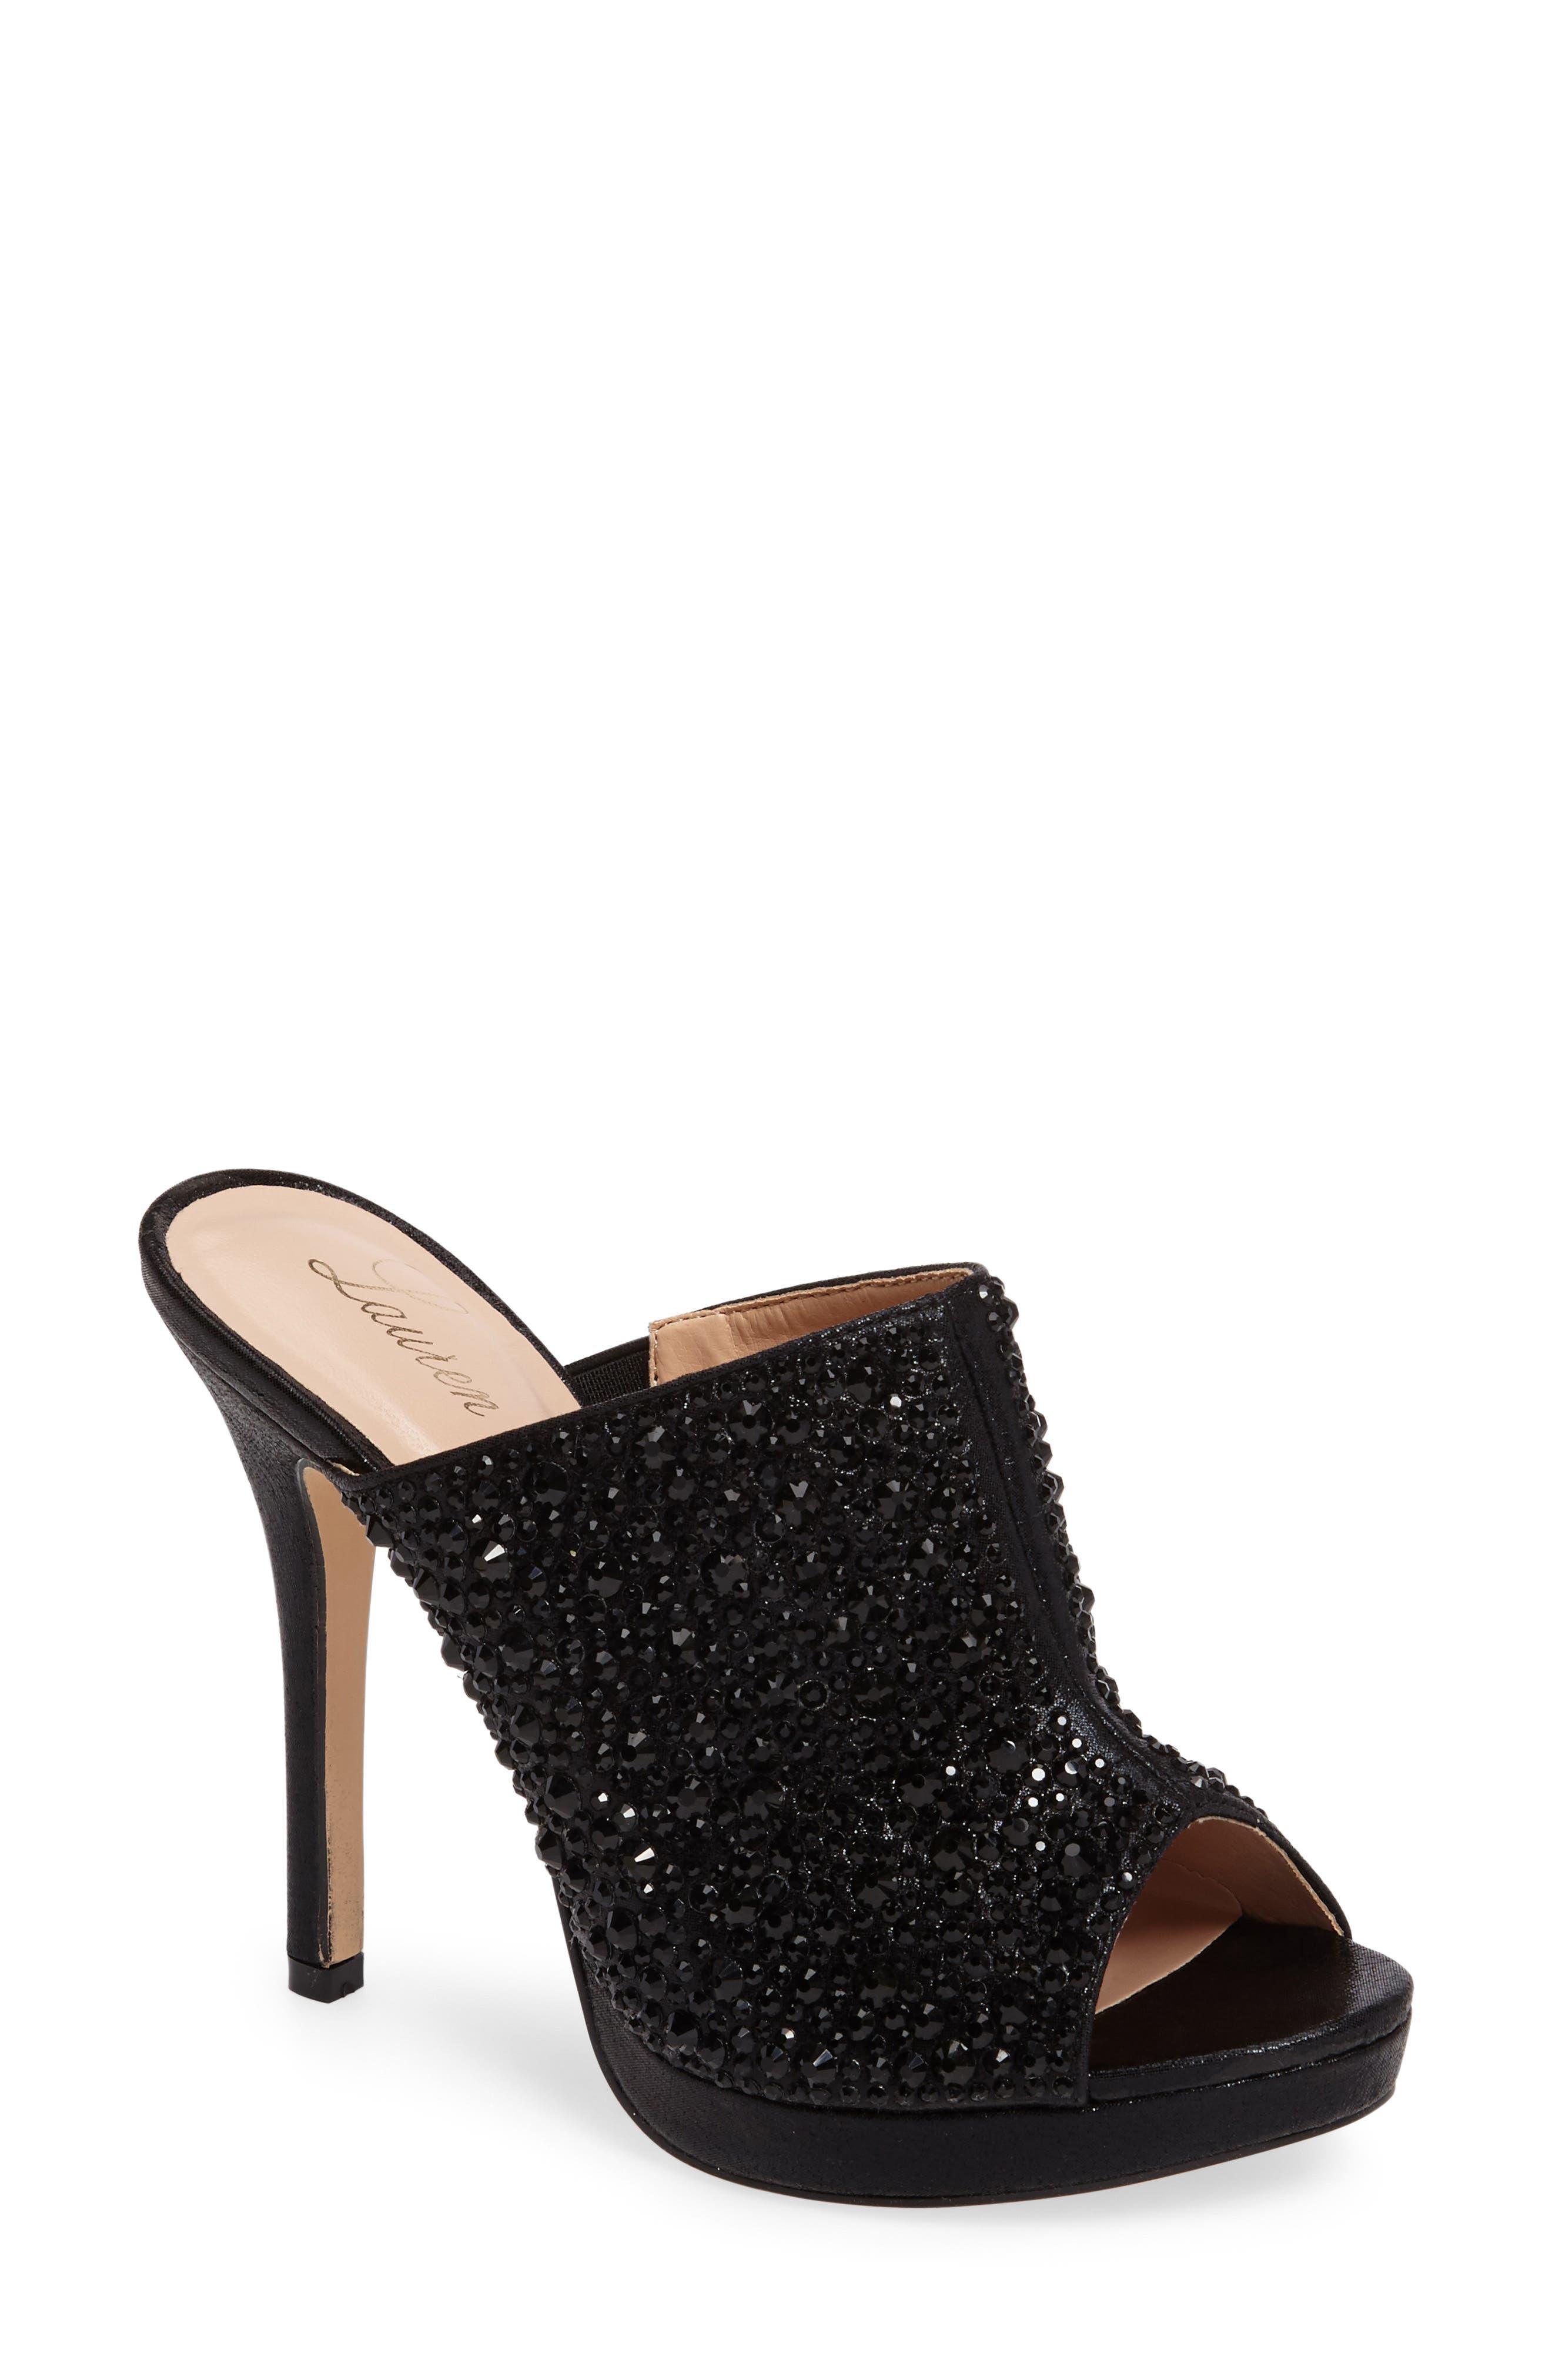 LAUREN LORRAINE, Mimi Embellished Slide Sandal, Main thumbnail 1, color, 001